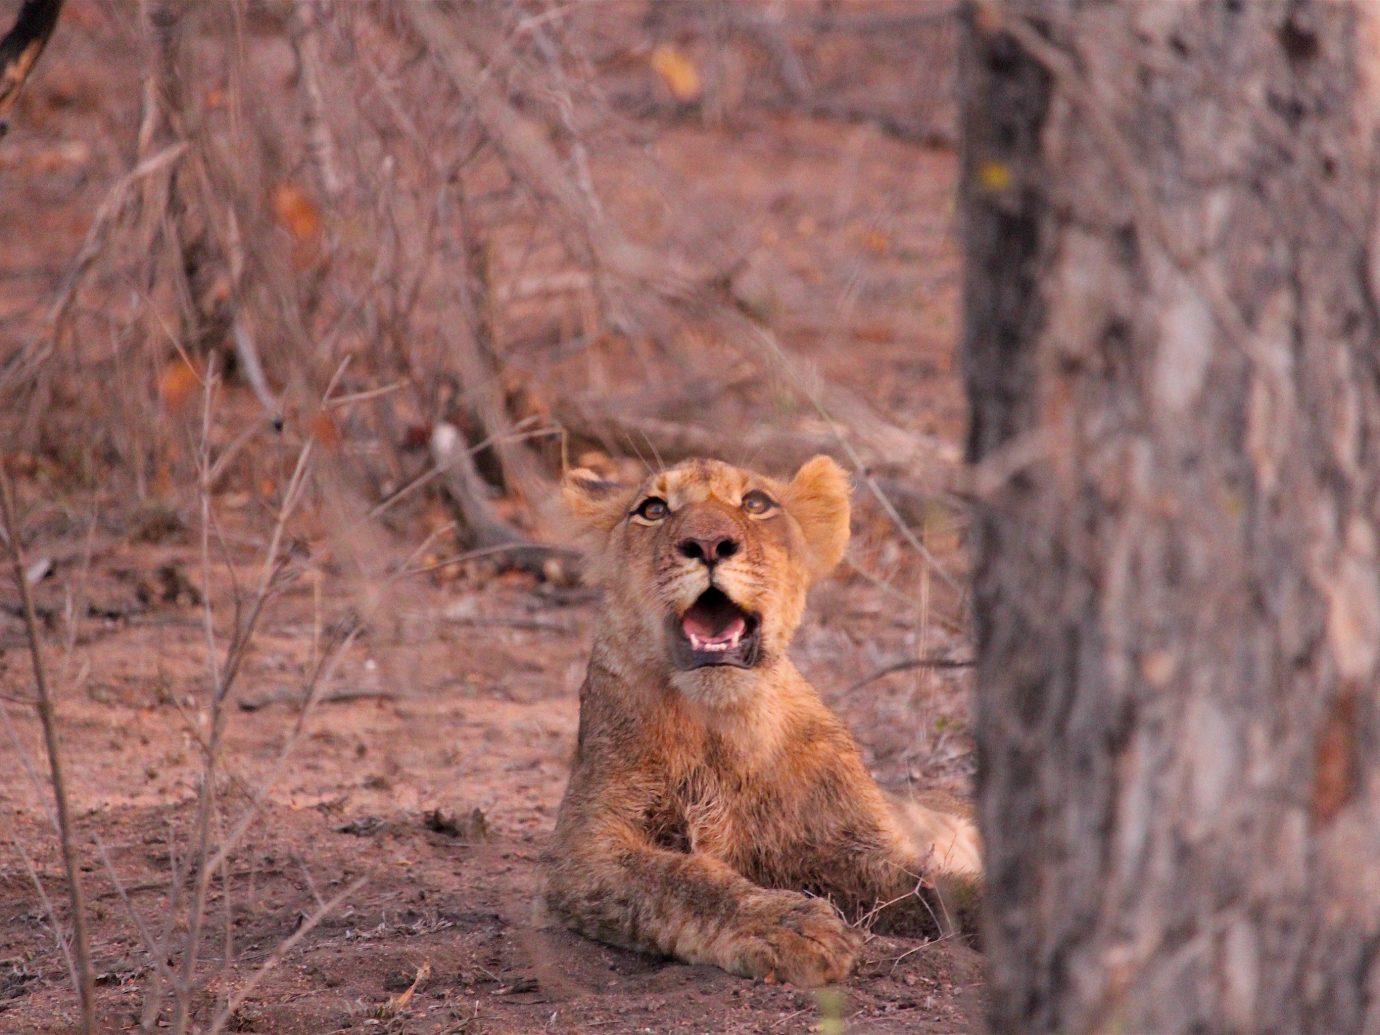 Outdoors + Adventure Safaris Trip Ideas animal outdoor mammal vertebrate Wildlife fauna brown Lion wood Safari area distance wooded